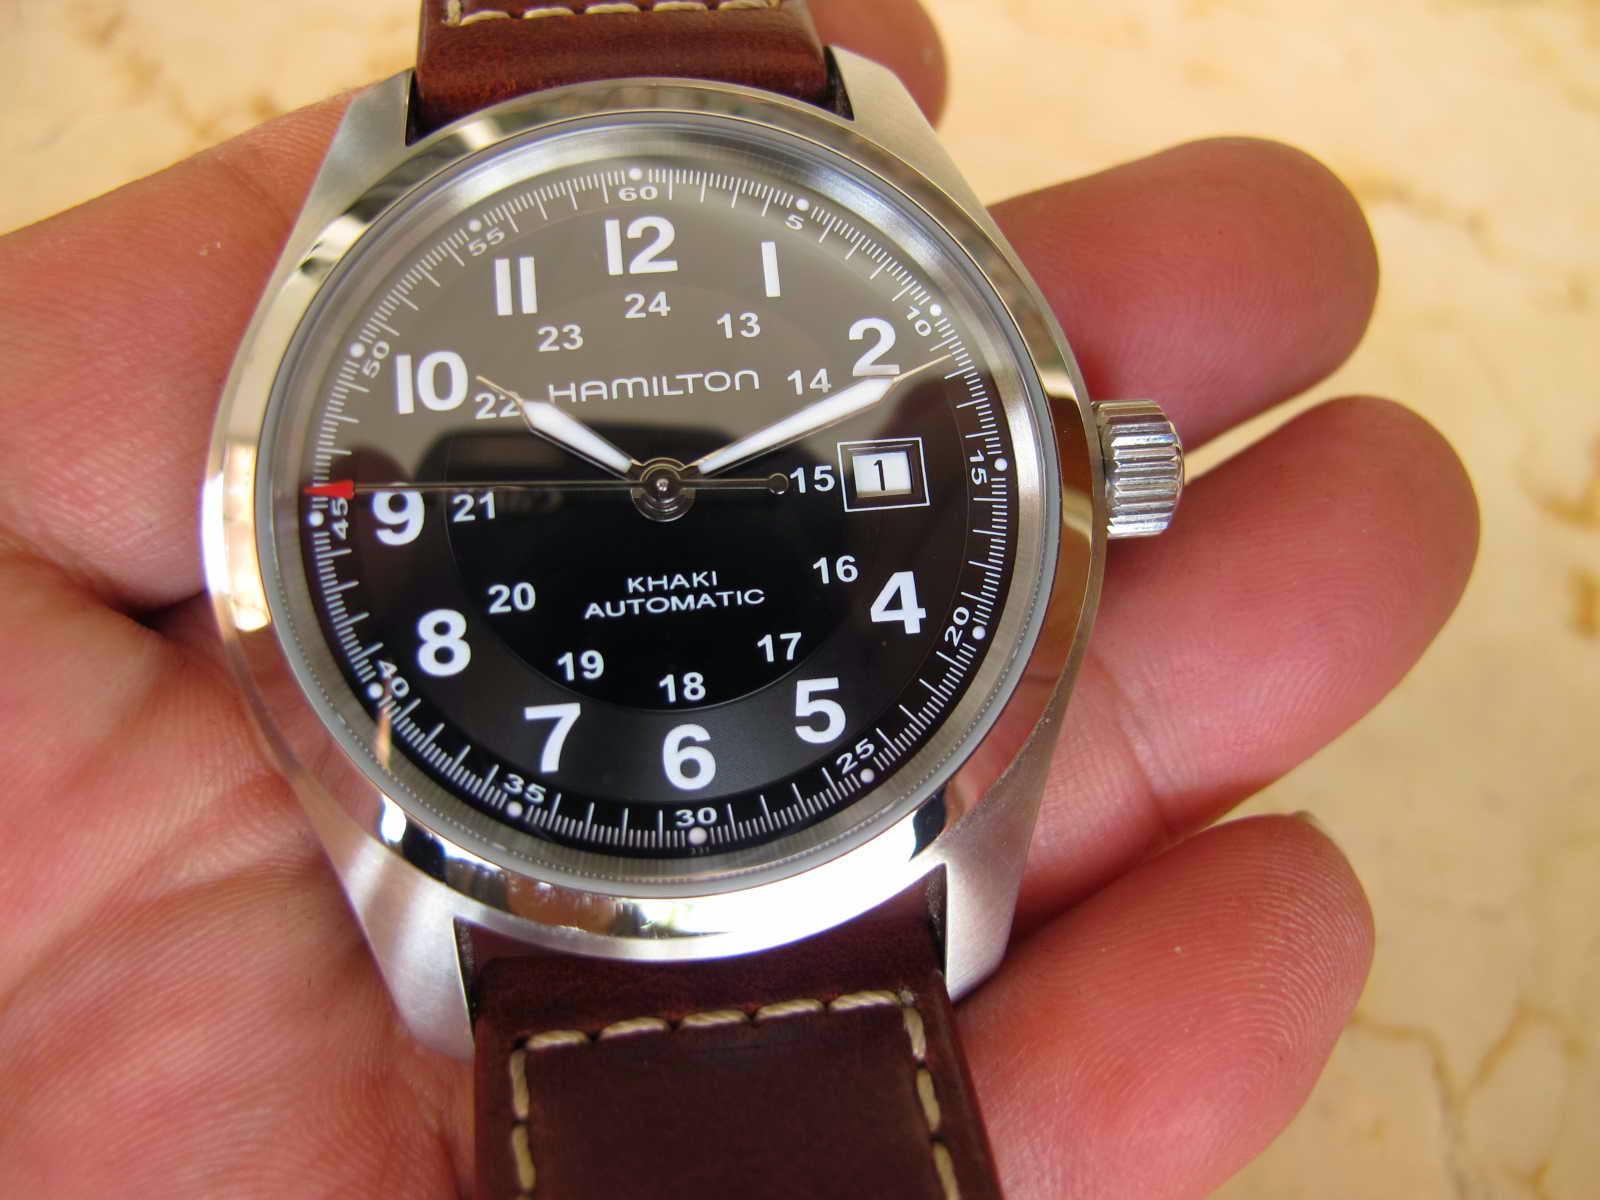 83ddb0aa7f8 Cocok untuk Anda yang sedan mencari jam tangan Military Watch... Swiss made  Automatic high beat... detik jalan super sweeping.... HAMILTON MILITARY .